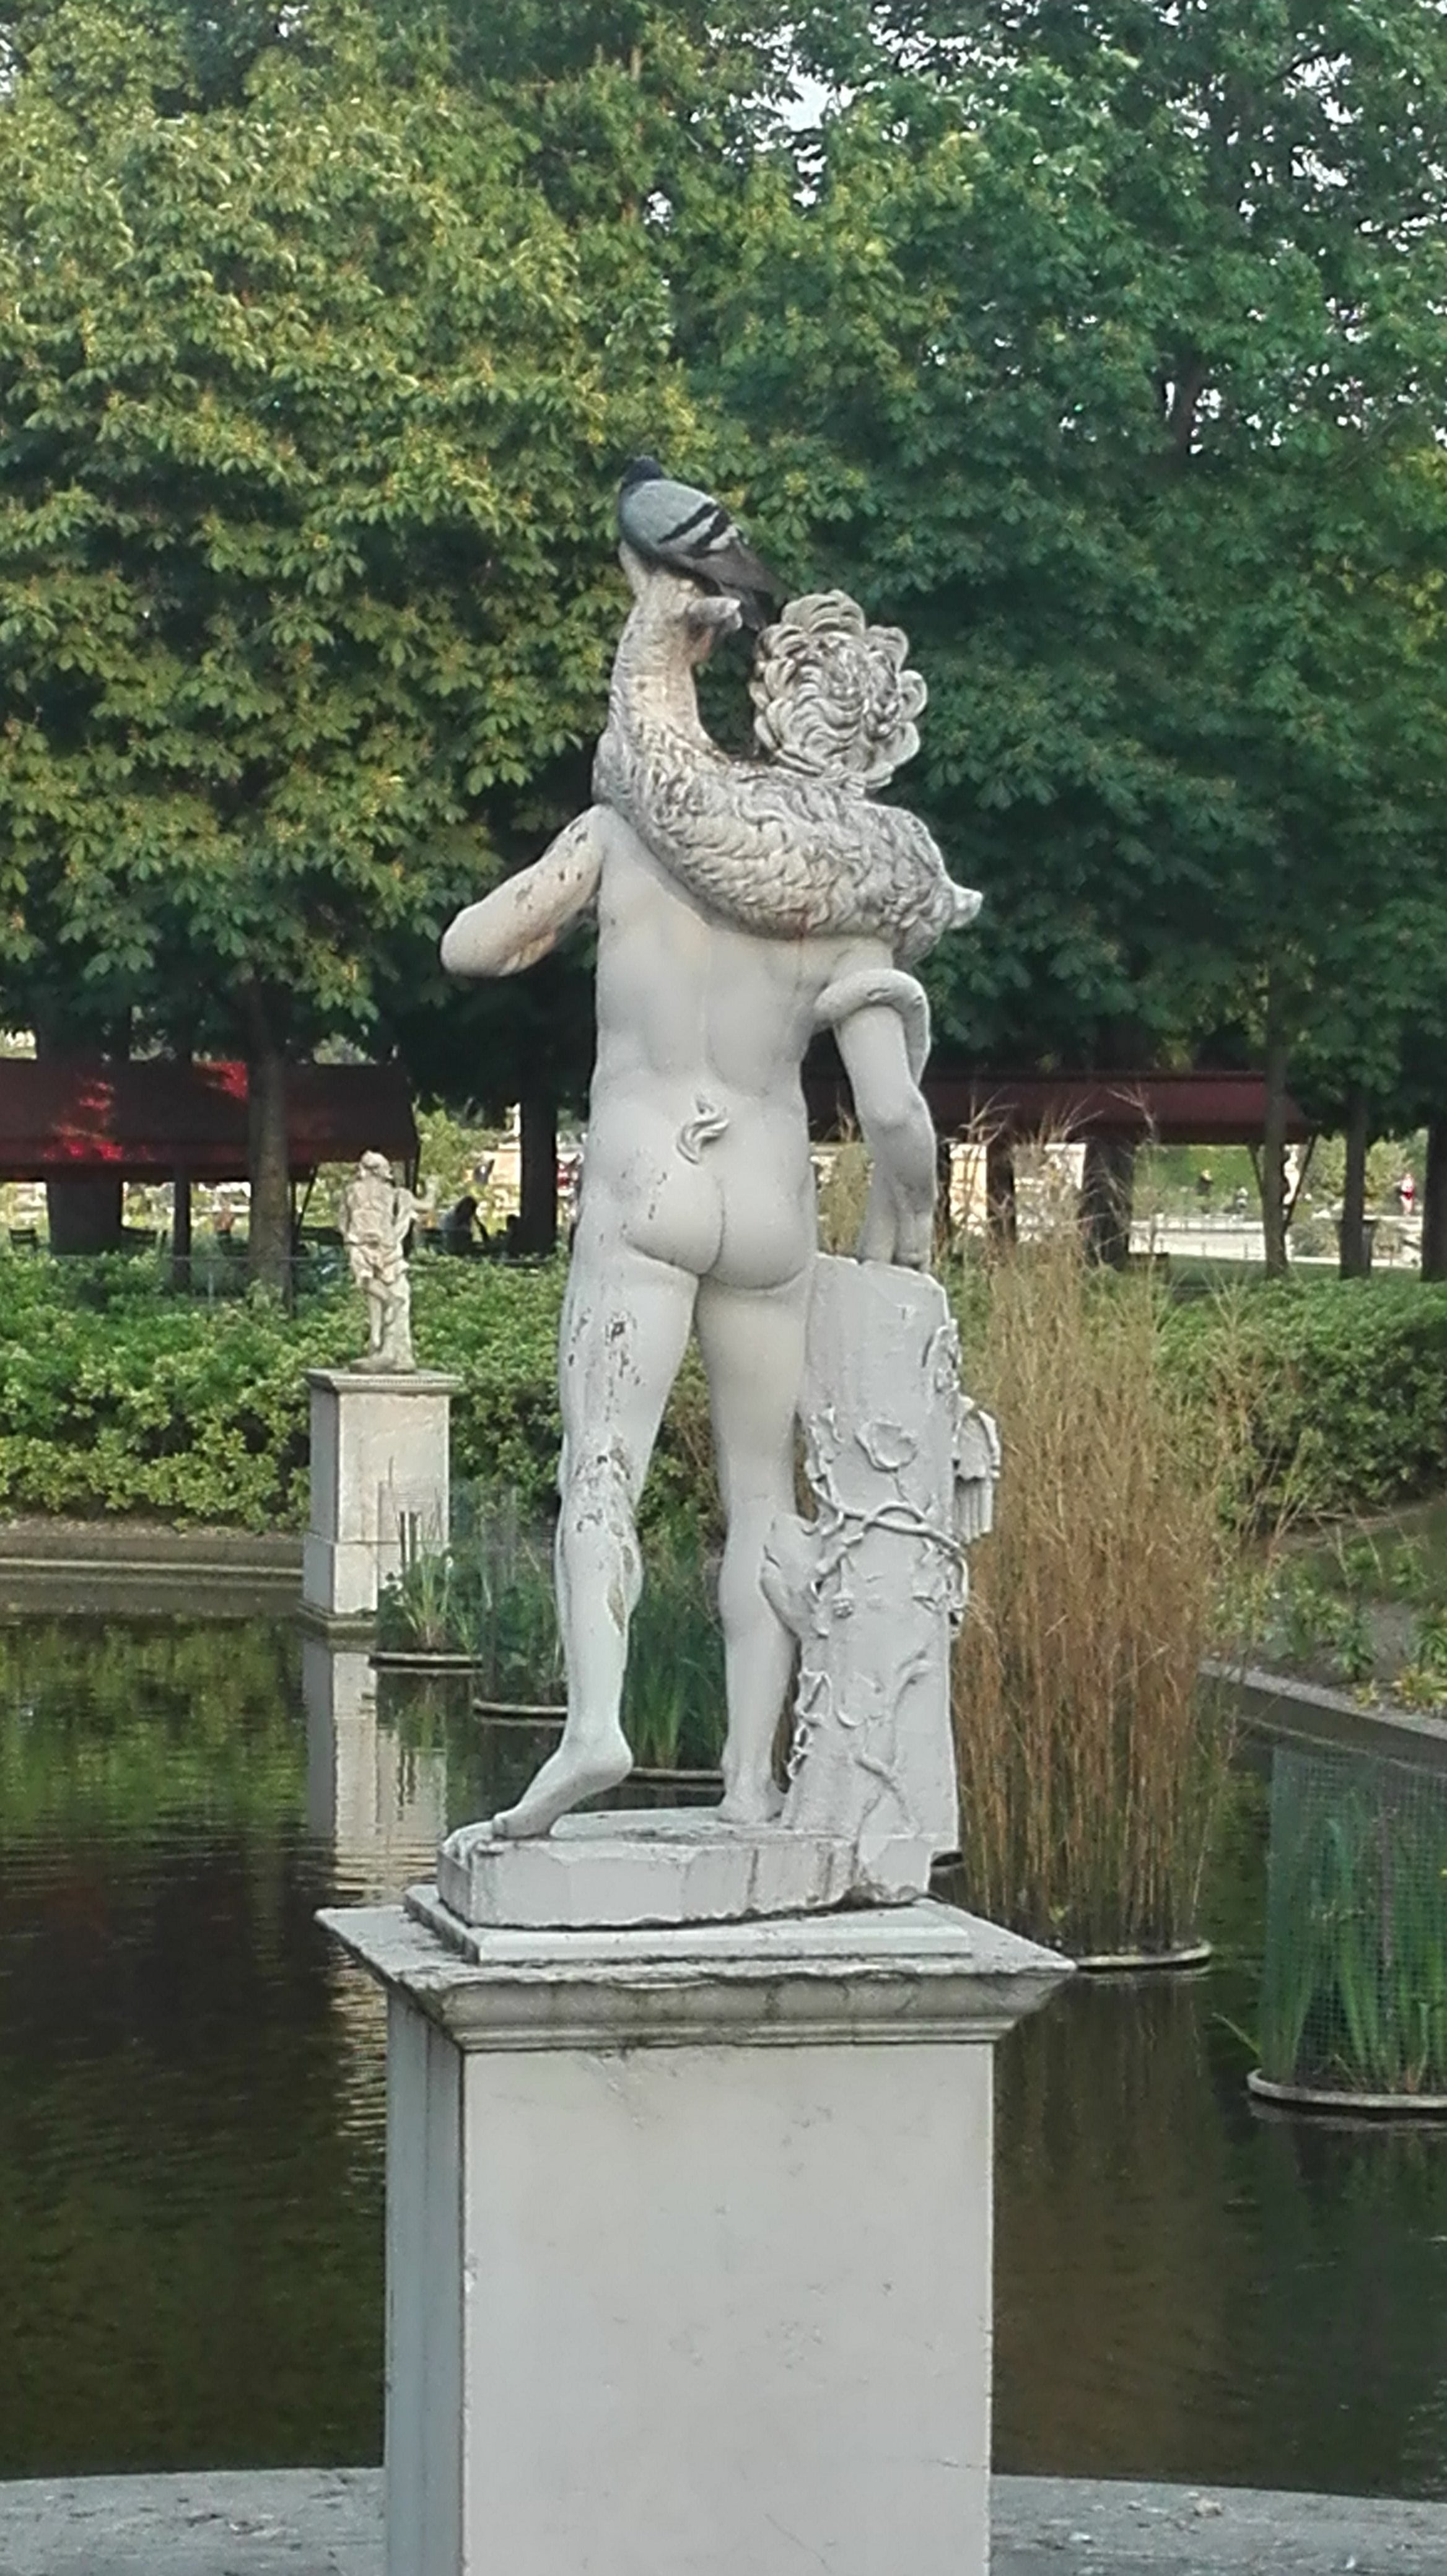 Sculpture_Jardin des tuileries